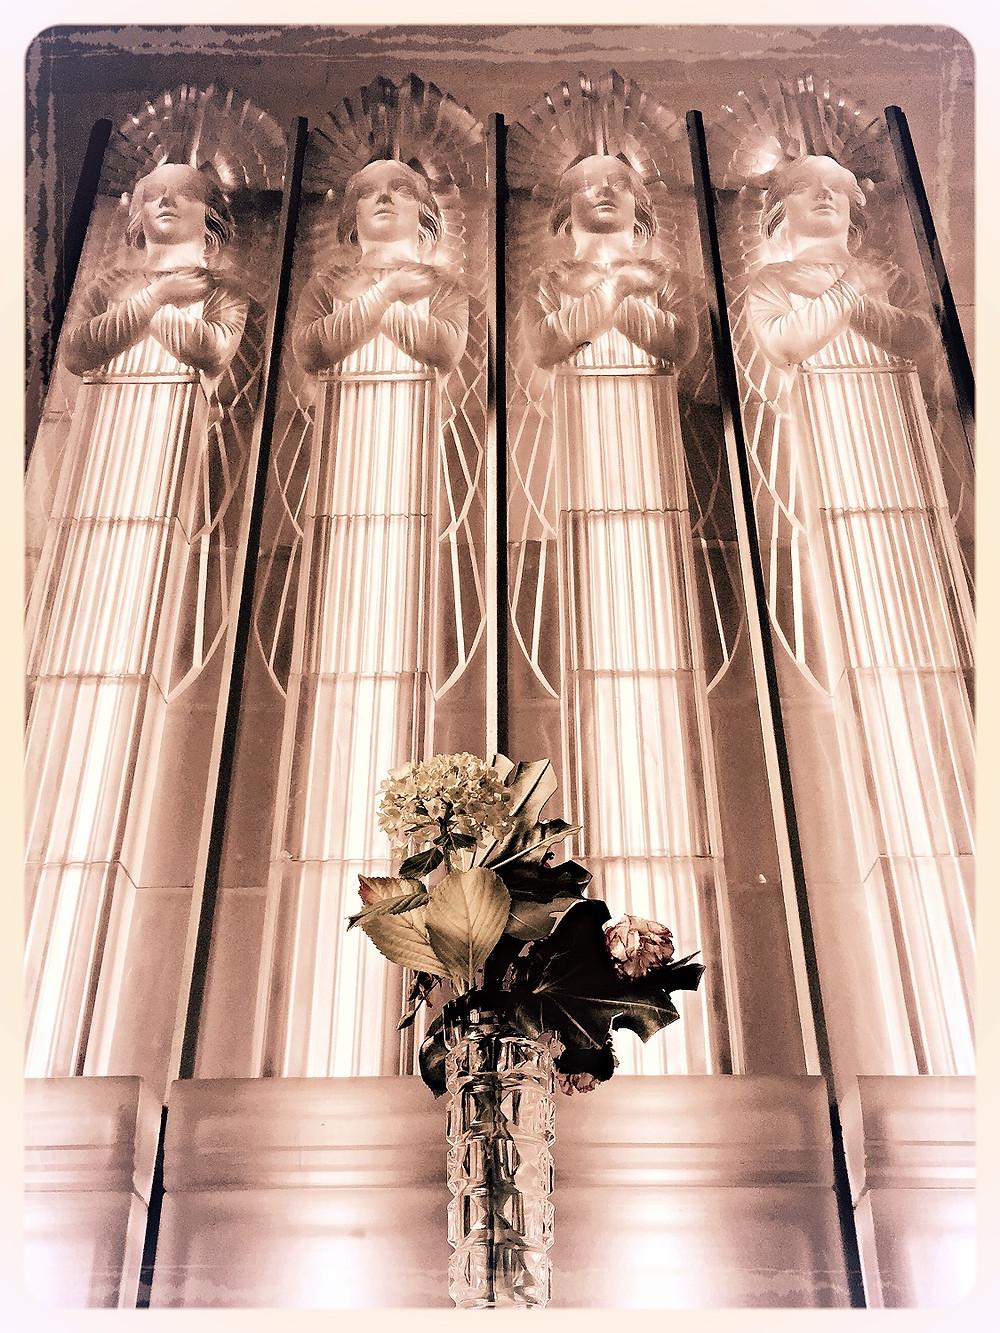 St. Matthew's Glass Church Angels